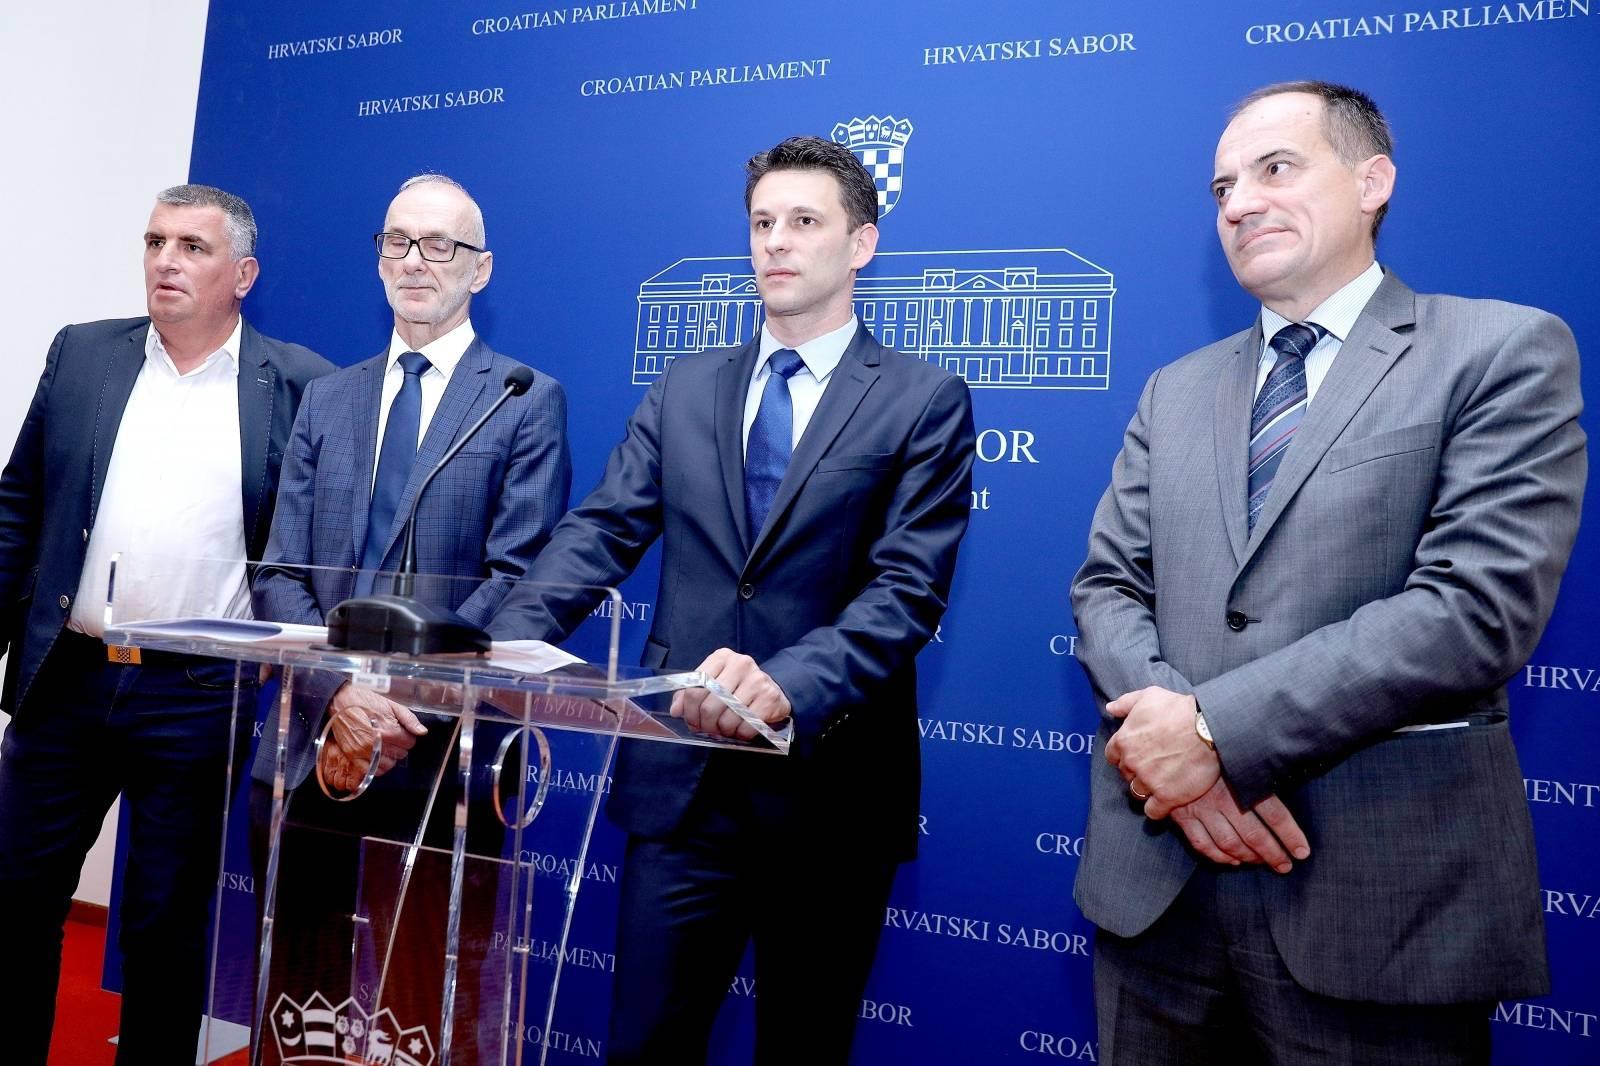 Zagreb: Konferencija za medije Kluba zastupnika Mosta NL o vodi kao ljudsko pravo